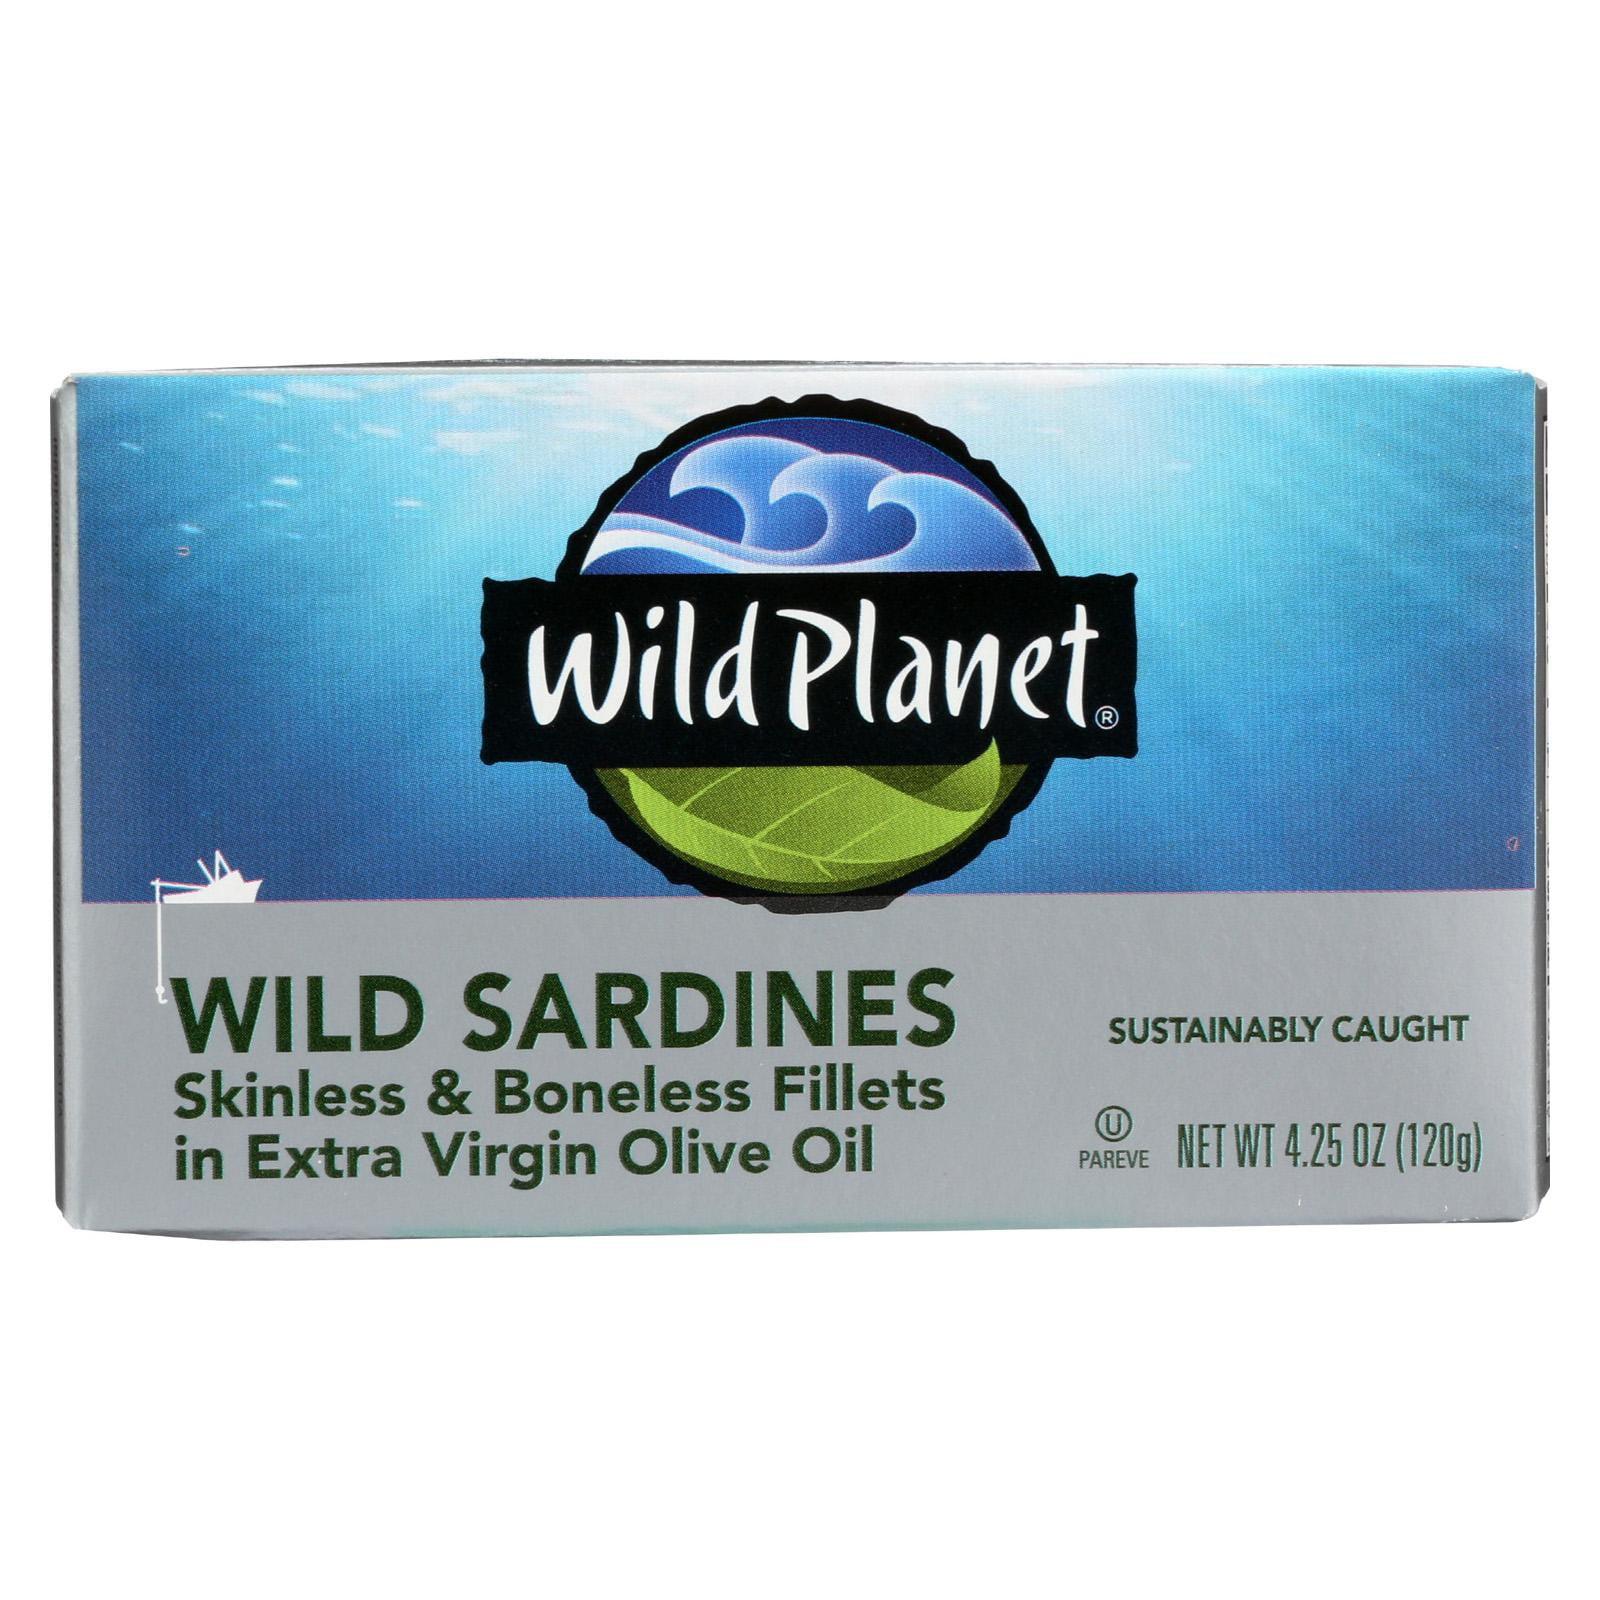 Wild Planet Wild Sardines - Skinless Boneless Fillets In Olive Oil - Pack of 12 - 4.25 Oz